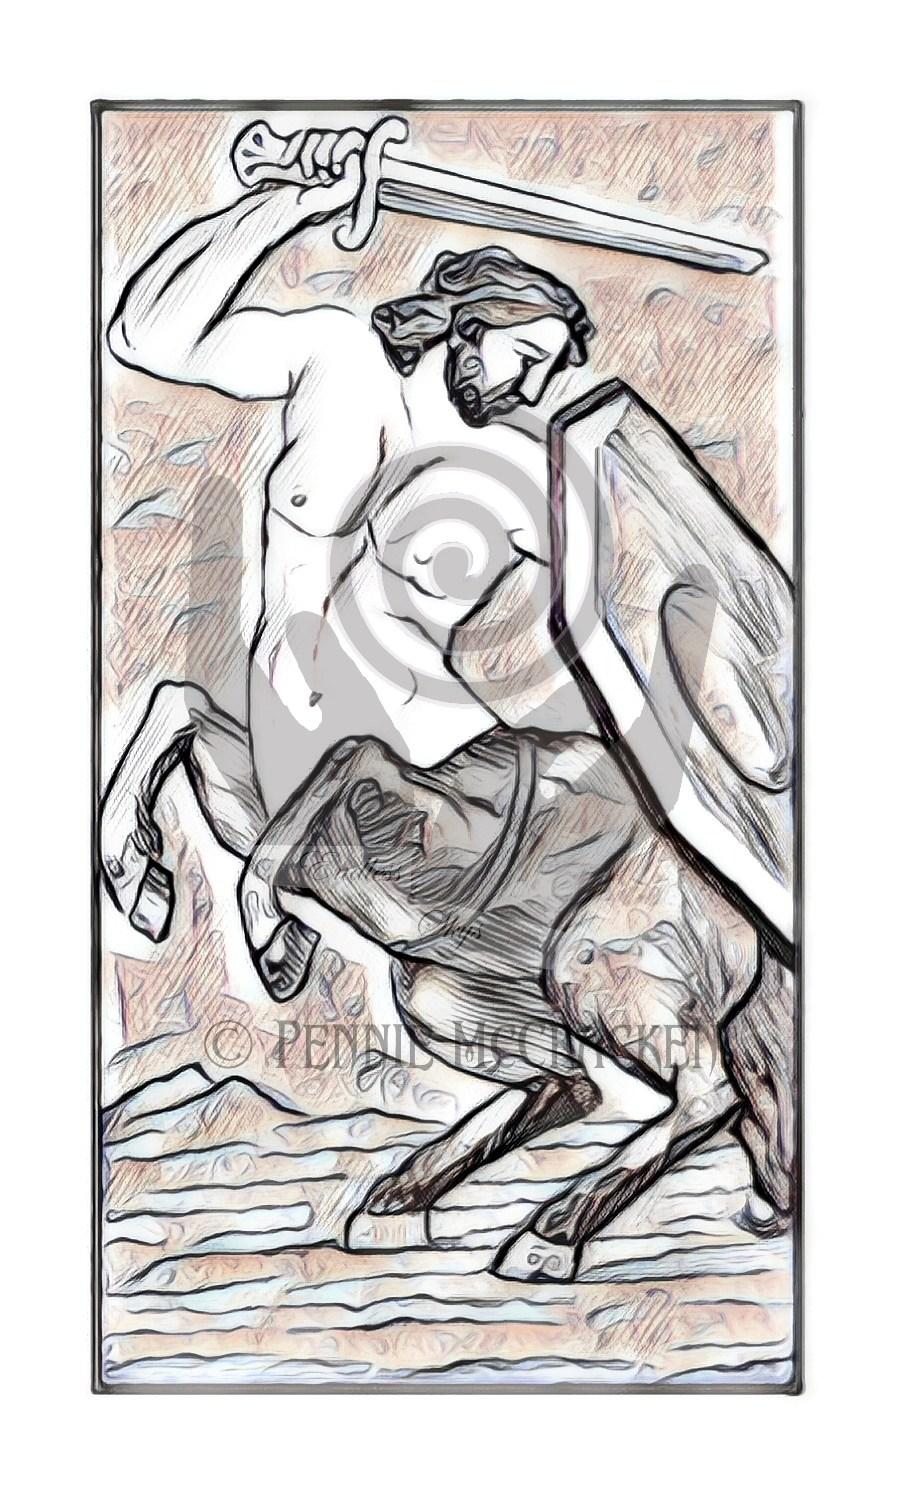 Minchiate Fiorentine Tarot Deck in Sketch Style by Pennie McCracken - Endless Skys